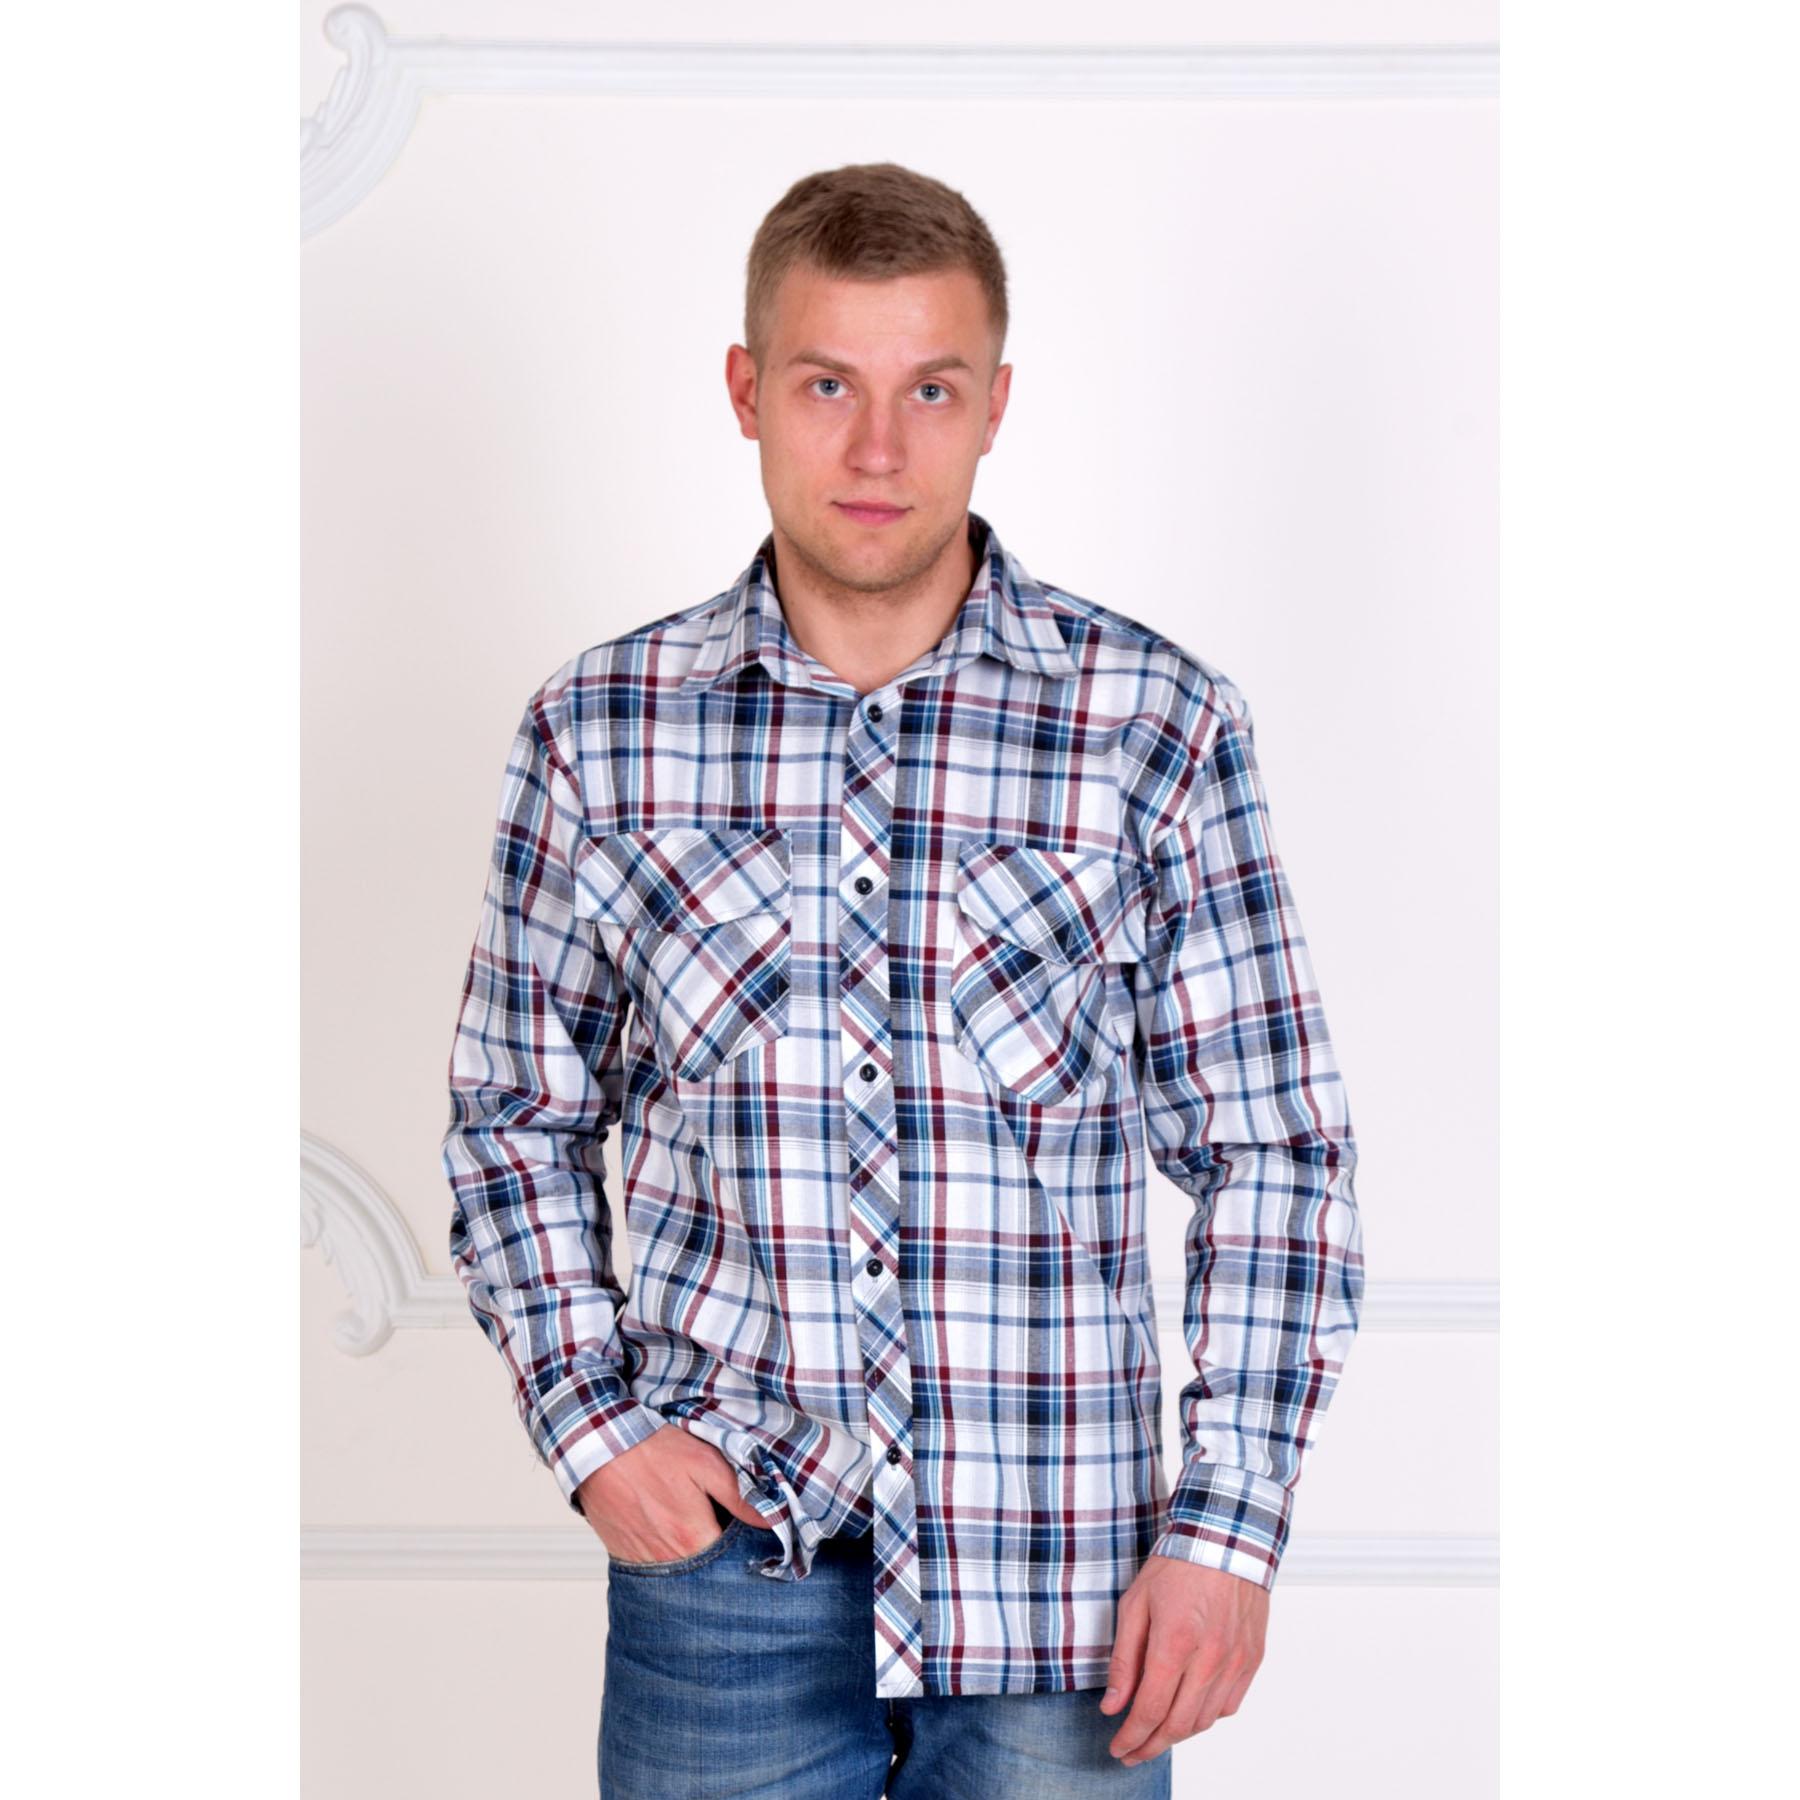 Мужская рубашка «Шотландия», размер 66Рубашки<br>Обхват груди:132 см<br>Обхват талии:128 см<br>Обхват бедер:134 см<br>Обхват шеи, ворот:49 см<br>Рост:178-188 см<br><br>Тип: Муж. рубашка<br>Размер: 66<br>Материал: Шотландка